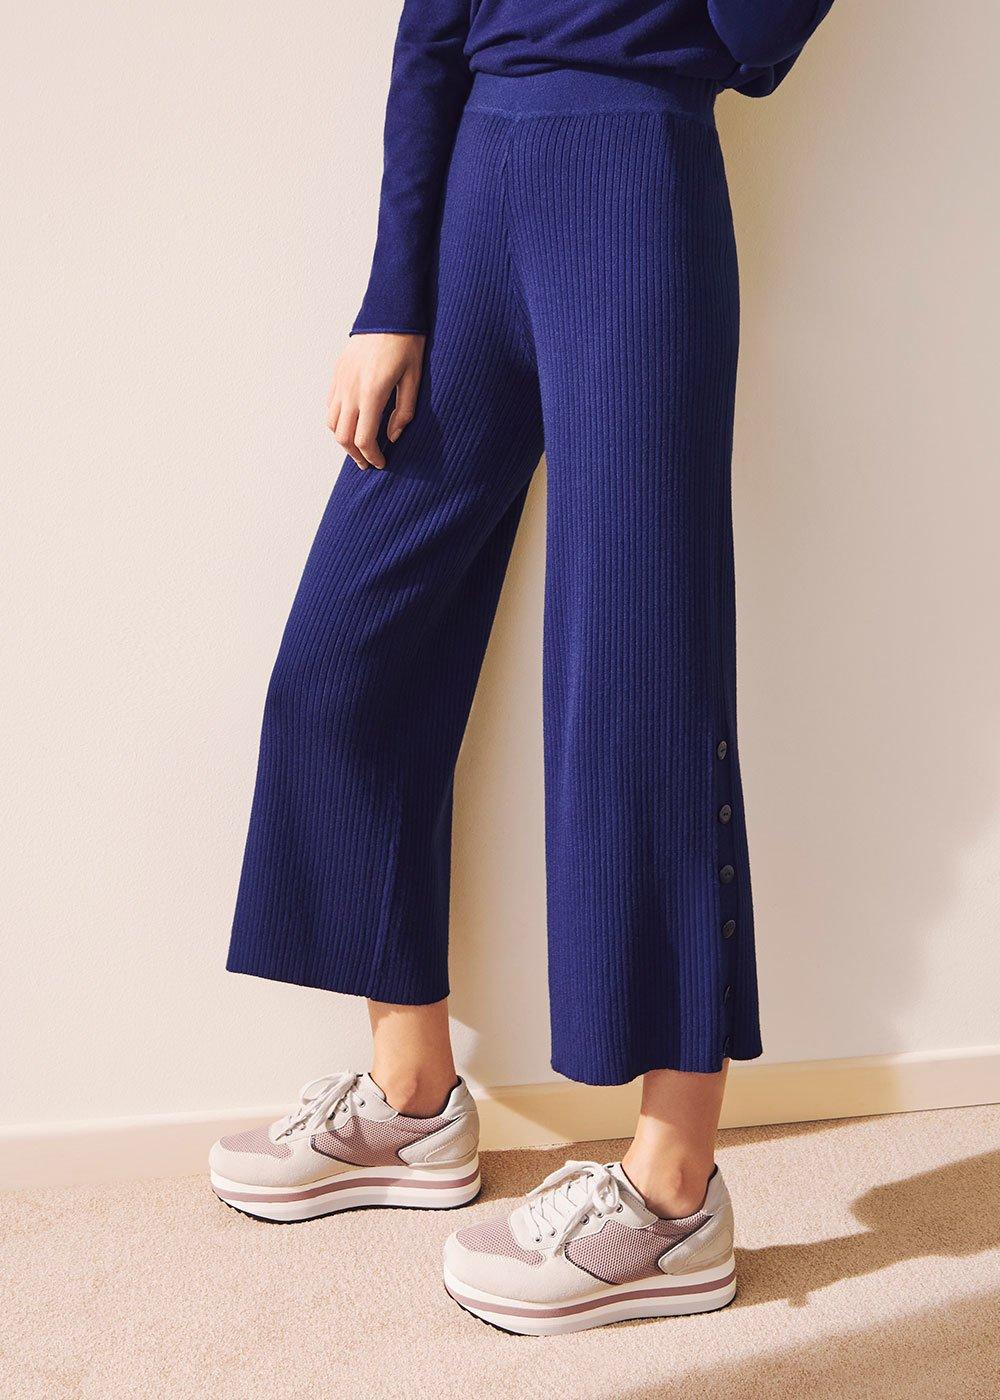 Portos knit trousers - Ultramarine - Woman